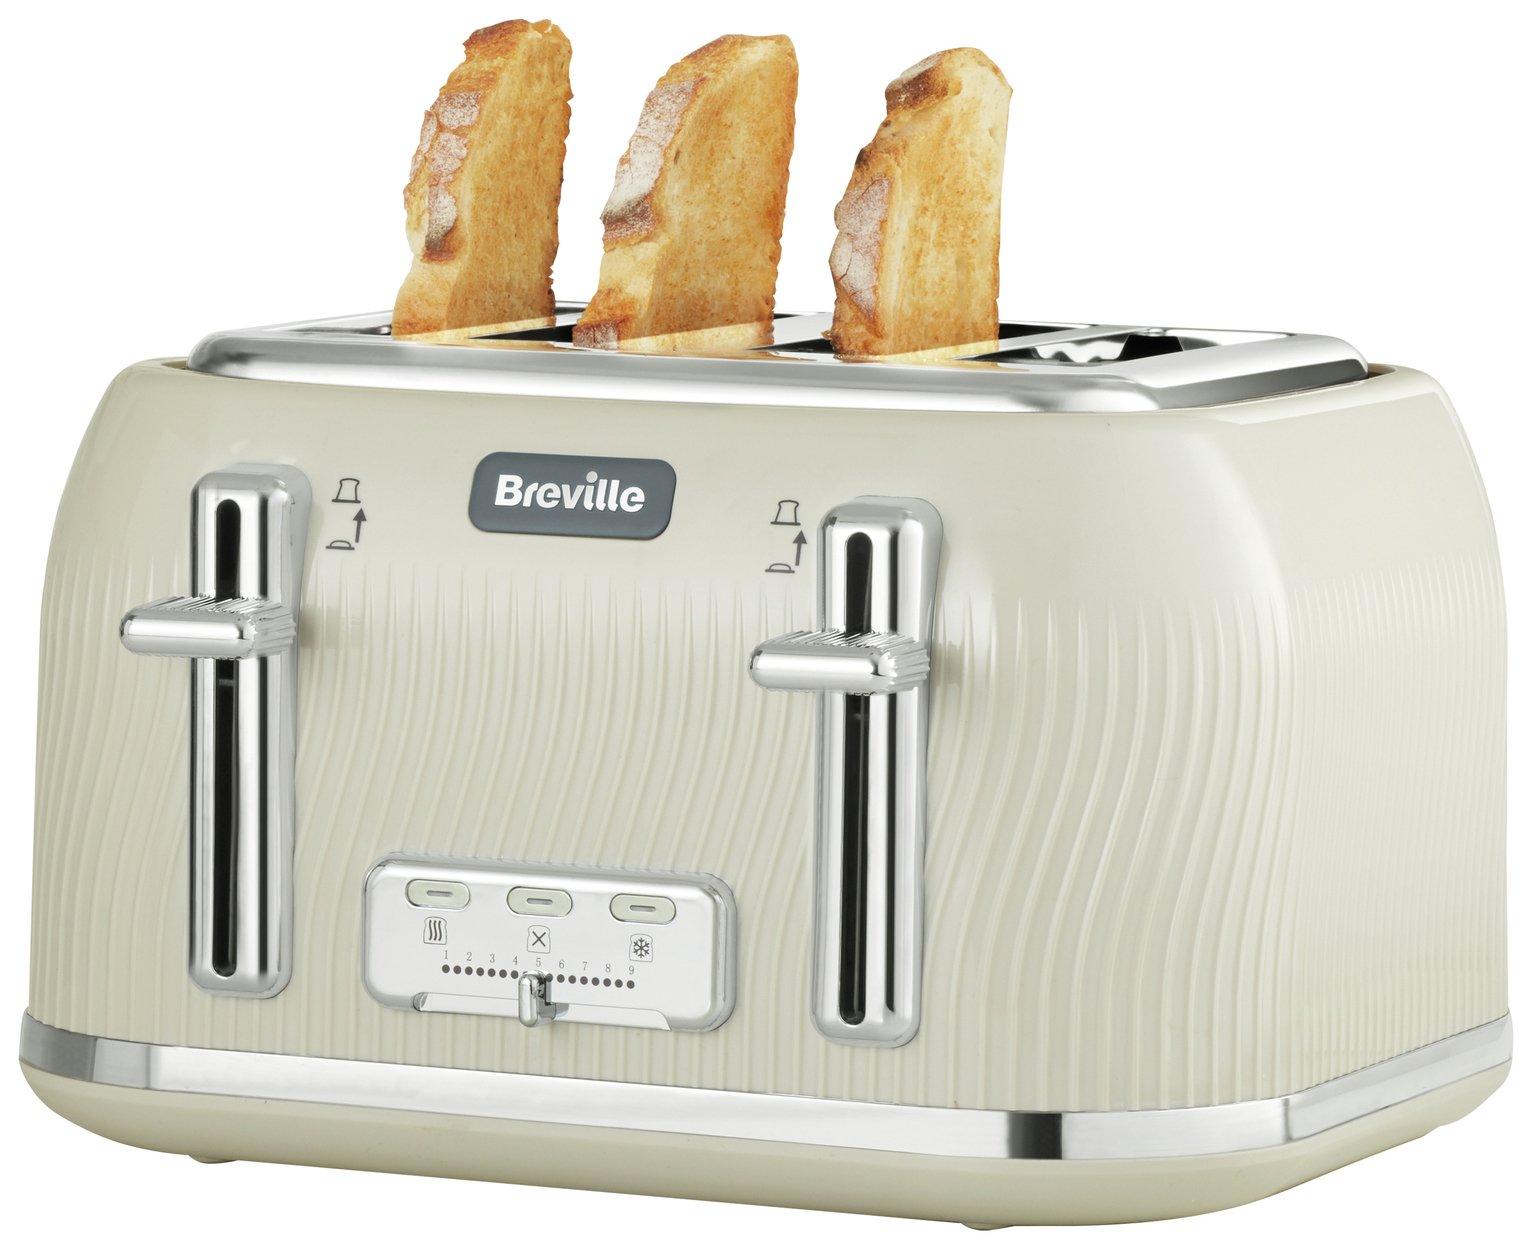 Breville VTT891 Flow 4 Slice Toaster - Cream